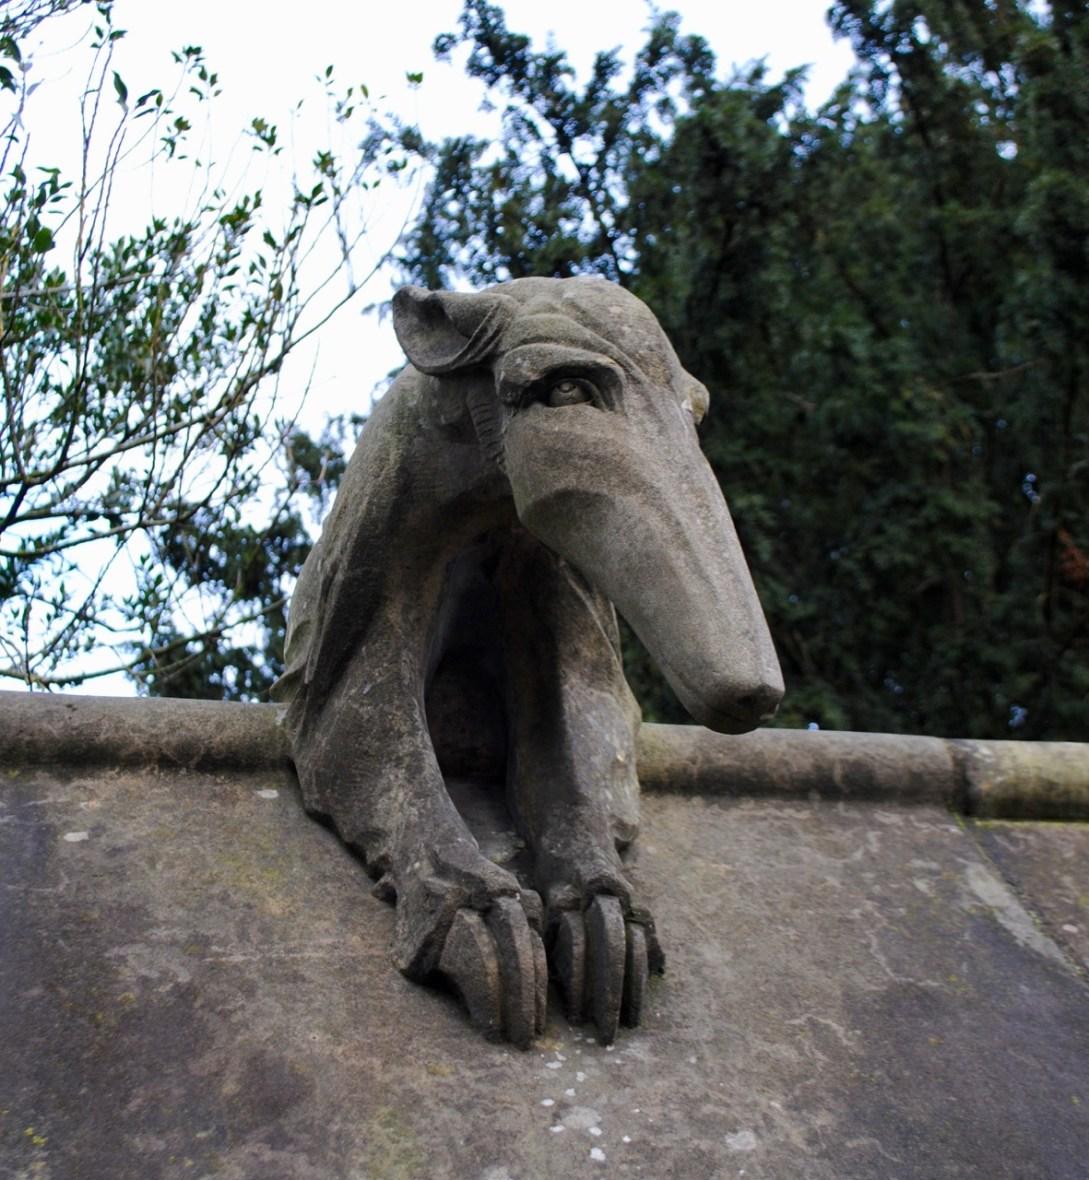 Cardiff animal wall anteater